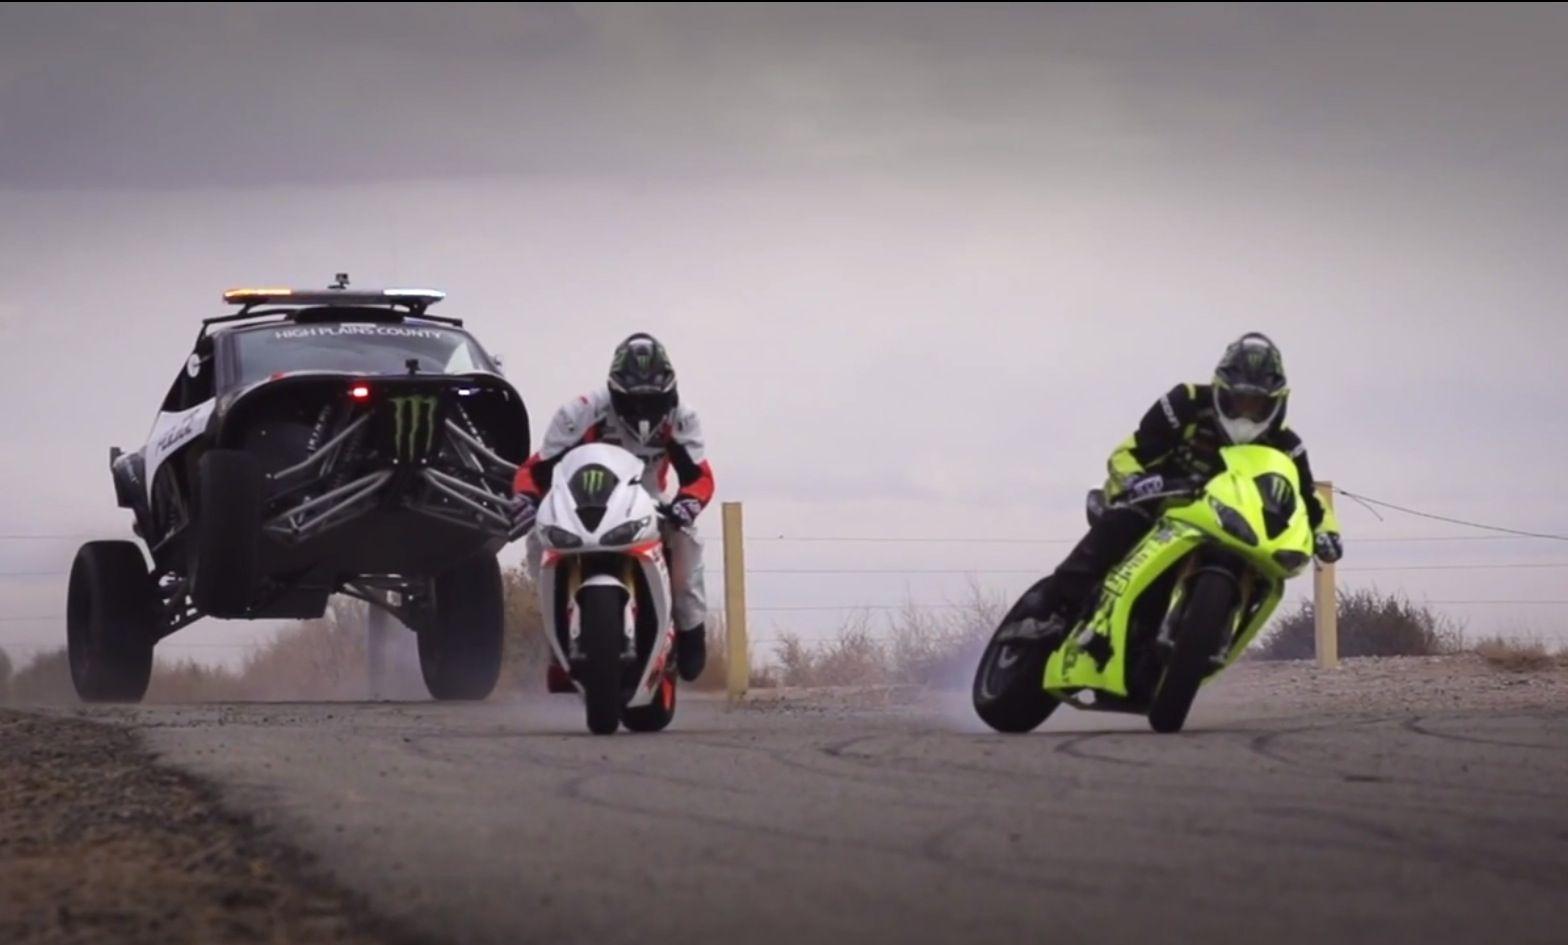 Icon Turbo Triumph Daytona Drift Bikes Video Daytona